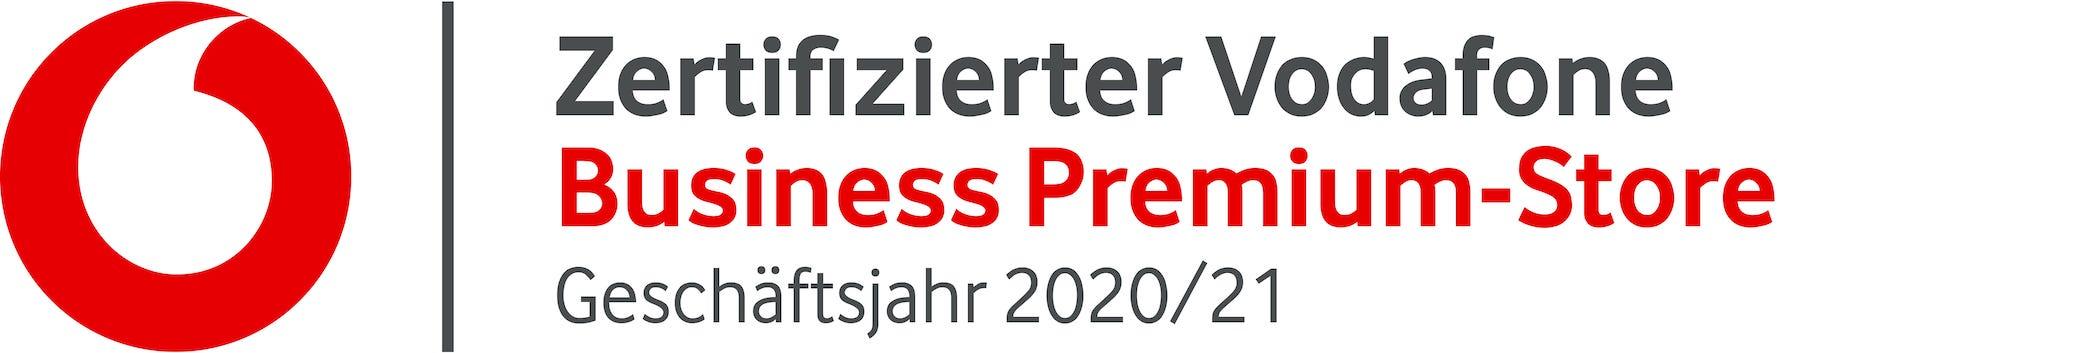 Zertifizierter Vodafone Business Premium-Store Foto Stoess